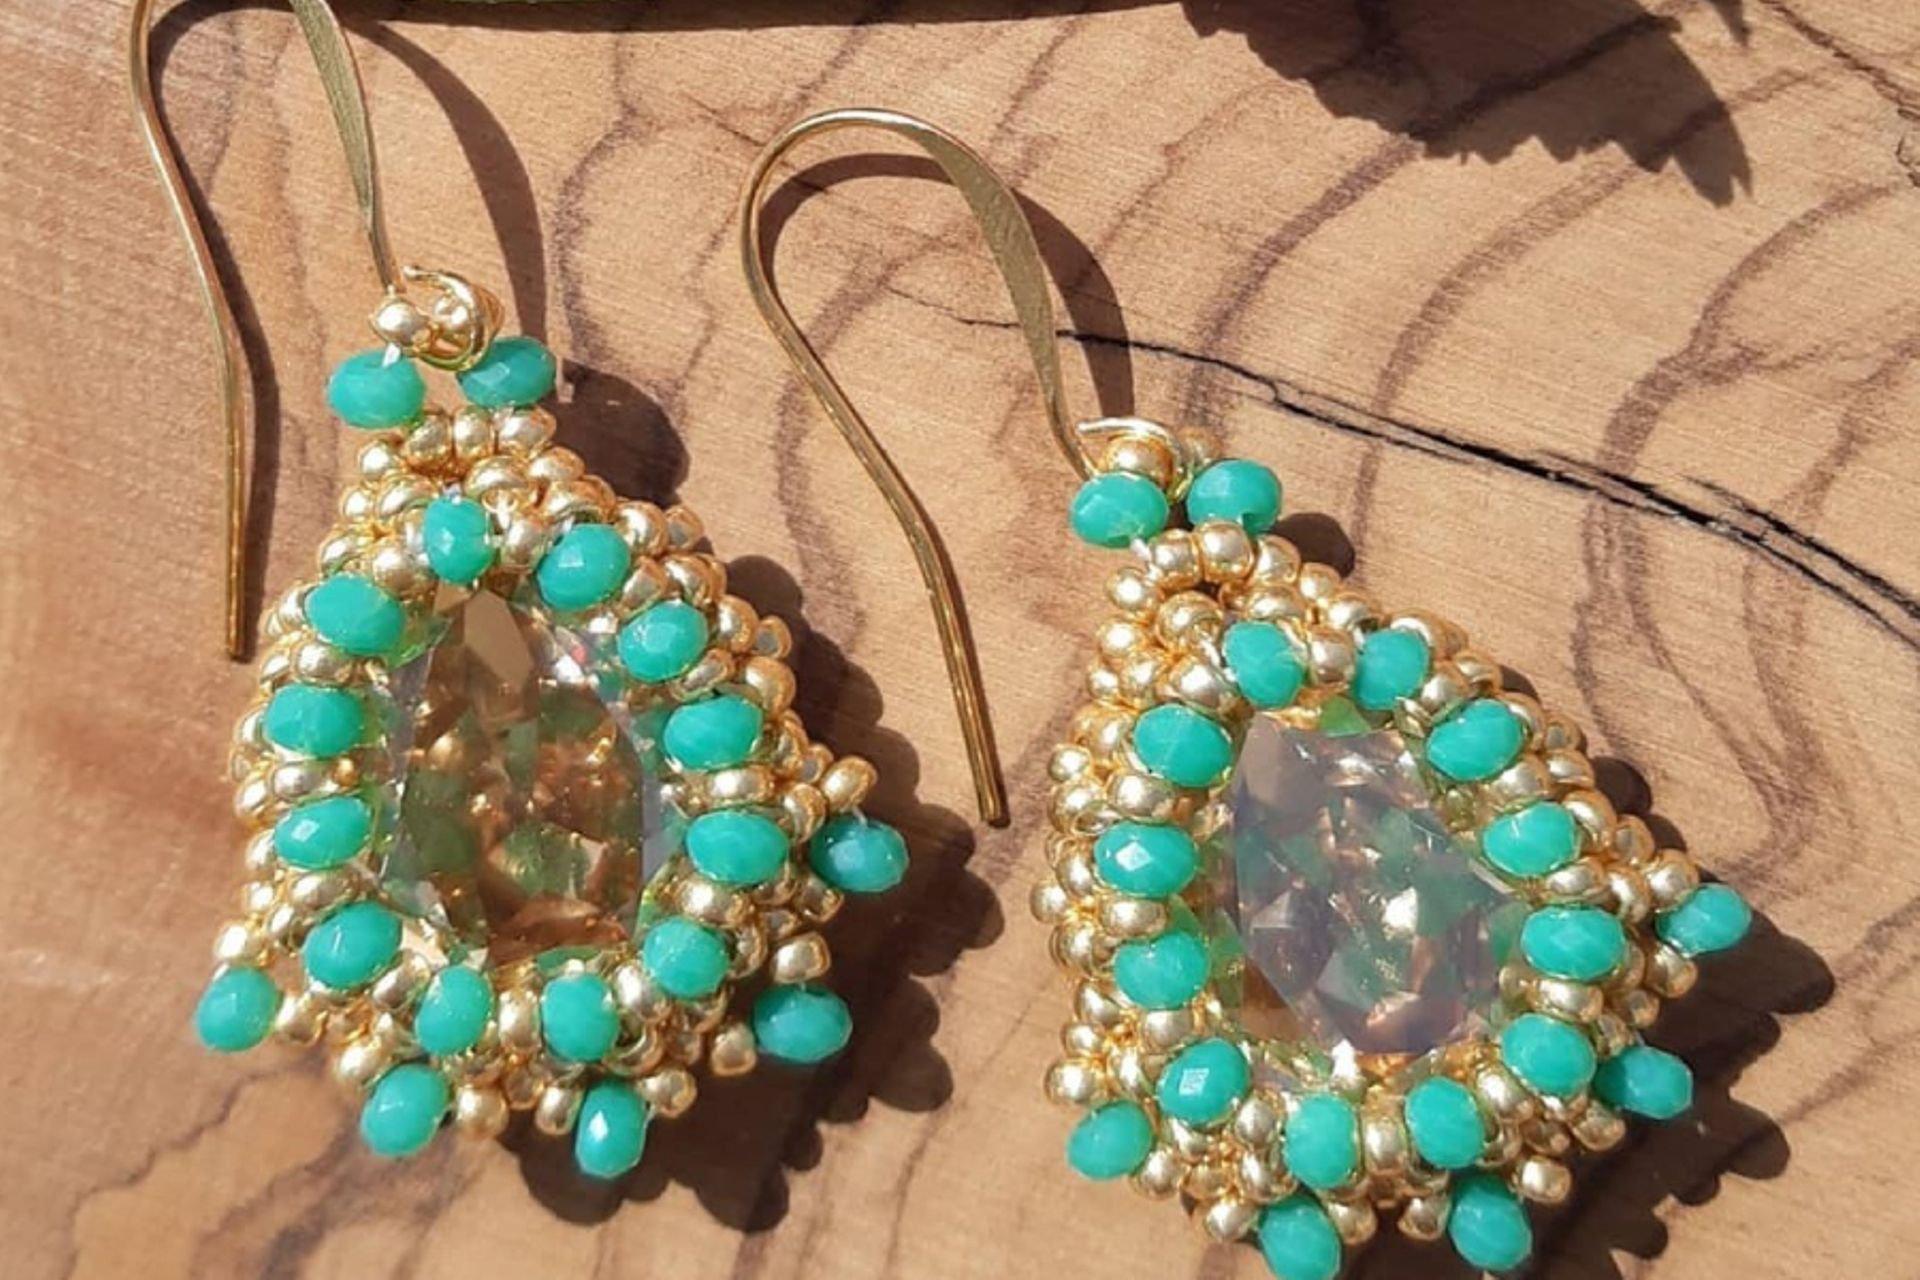 8 lantana beads jewelry designer תְמוּנָה